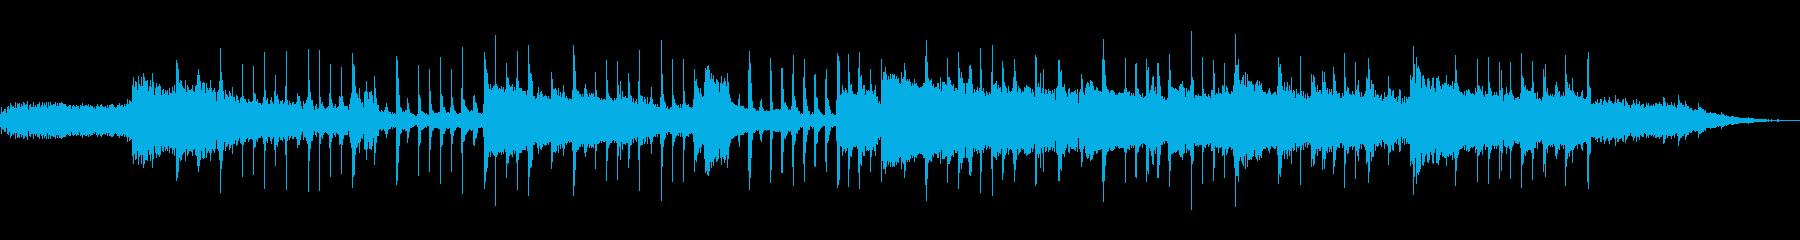 SIGHSのセクシーなリラックスグルーブの再生済みの波形